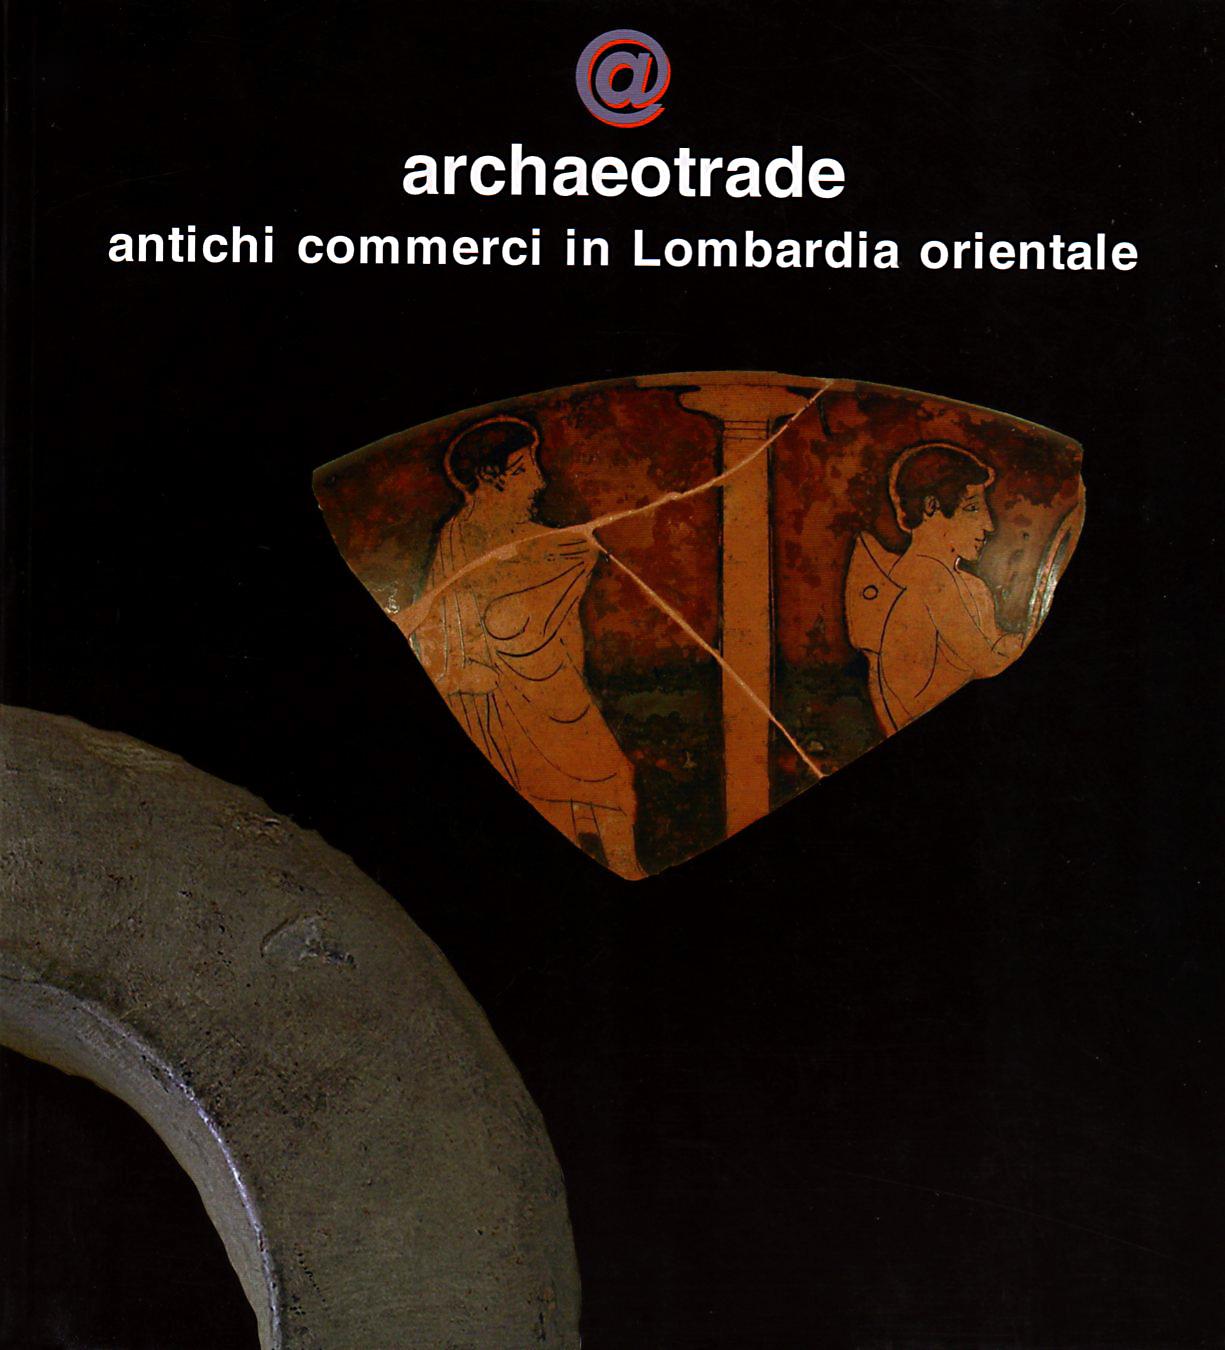 Archaeotrade. Antichi commerci in Lombardia orientale